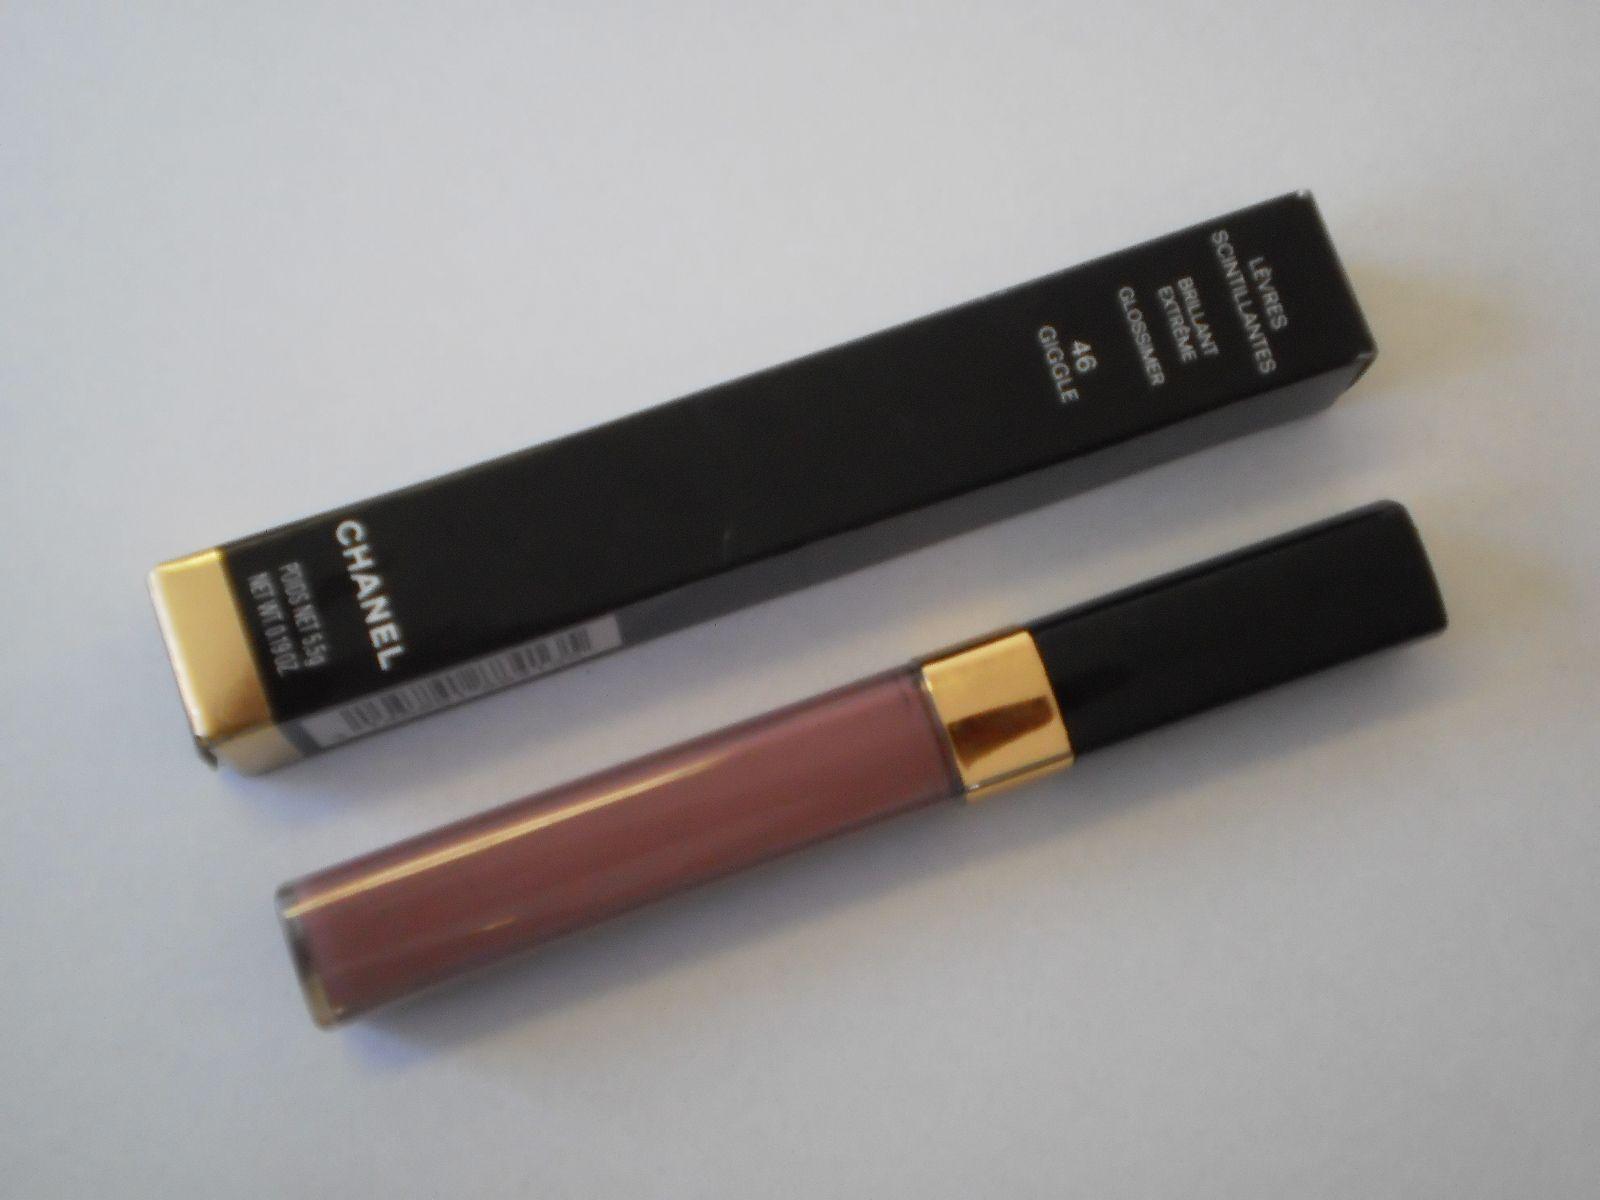 Chanel, Giggle lip gloss. works on everyone!